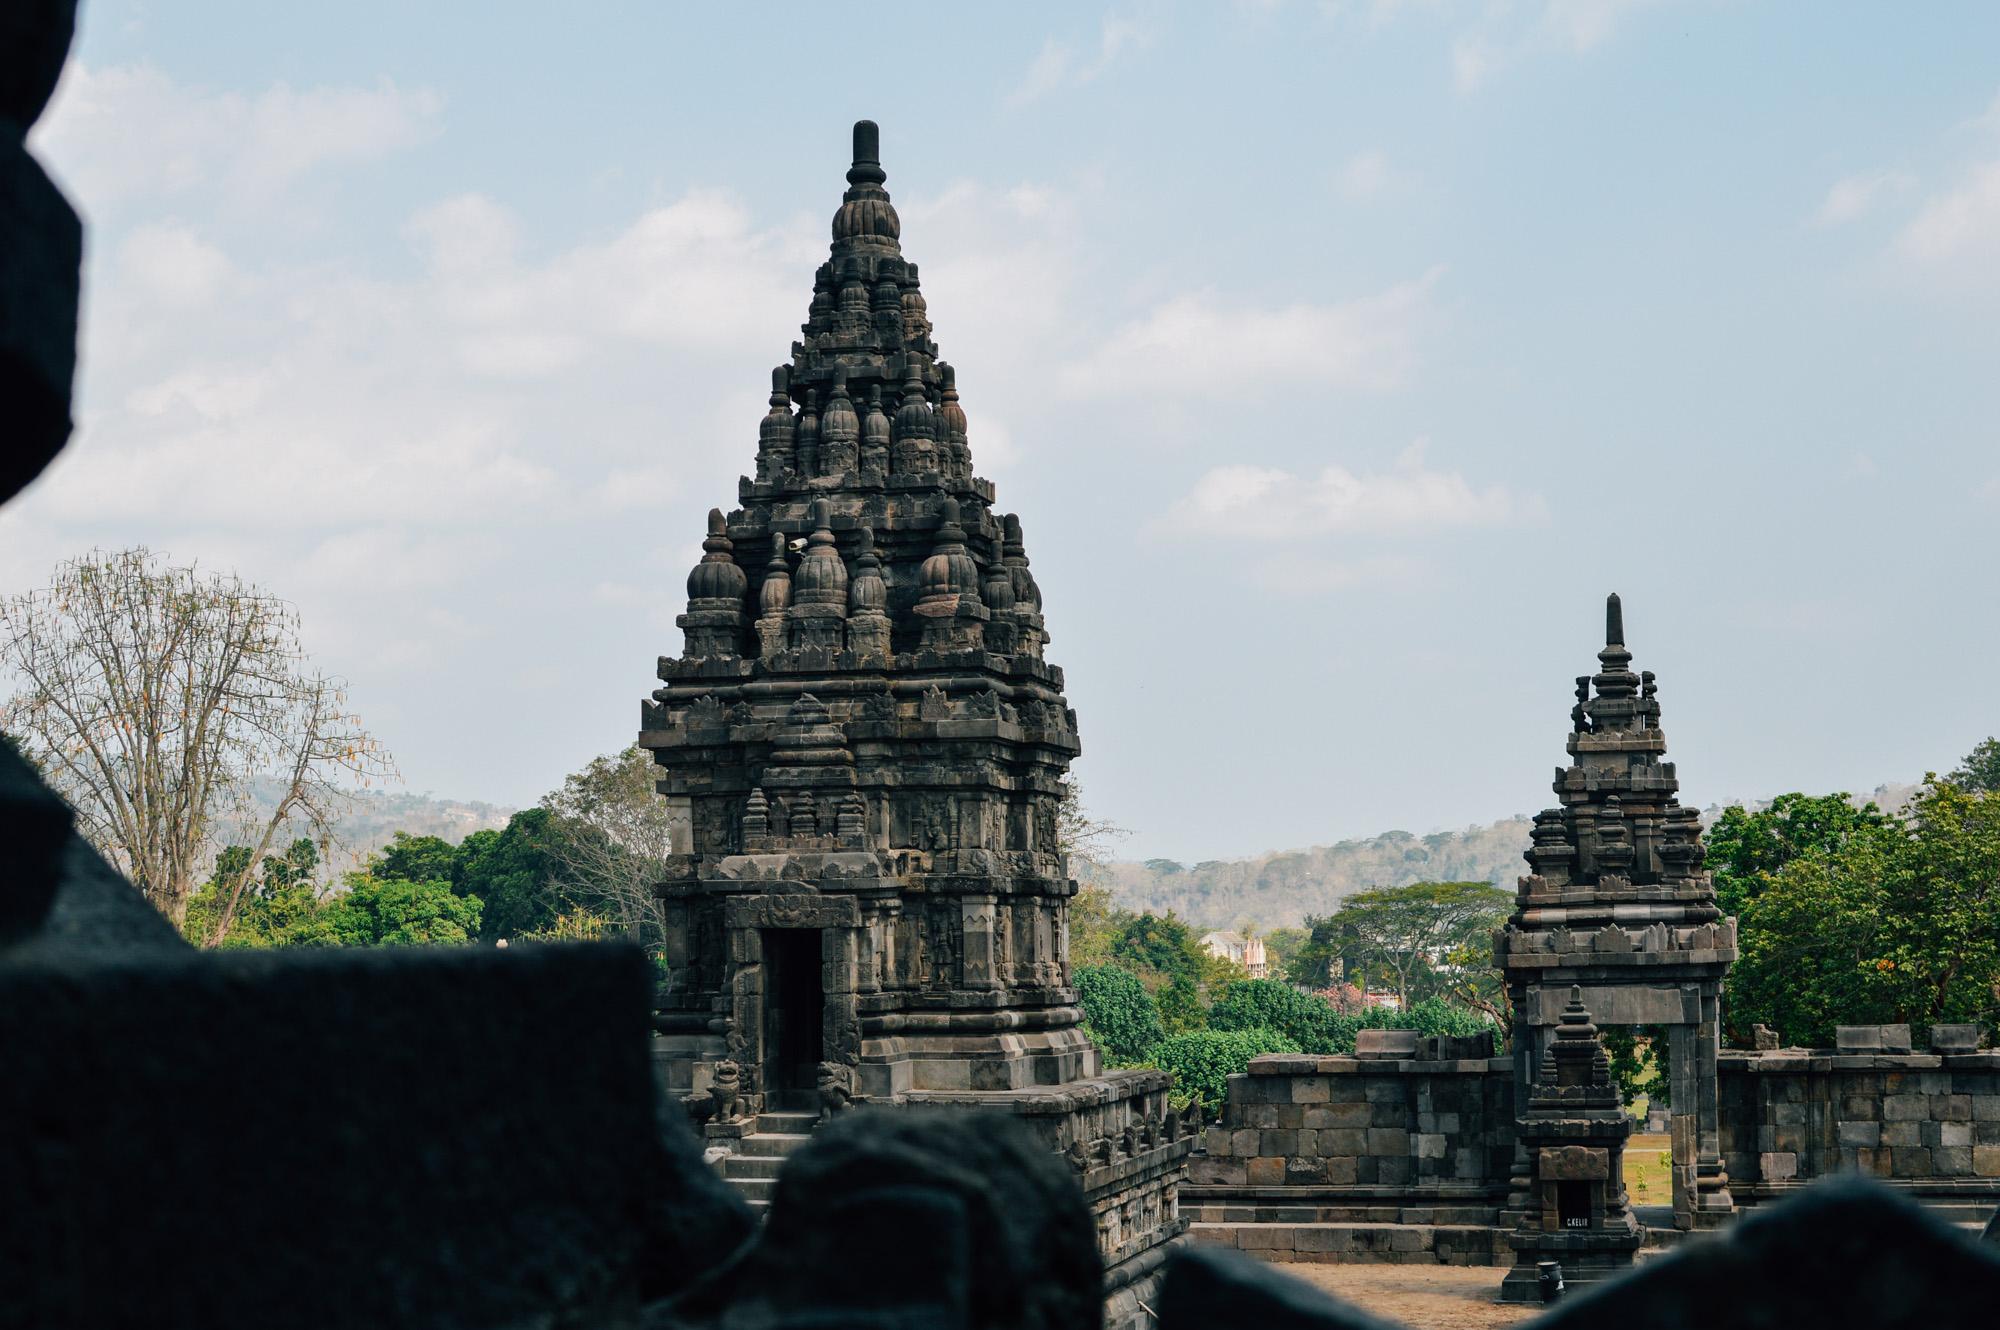 prambanan 2 - Jogyakarta with Temples